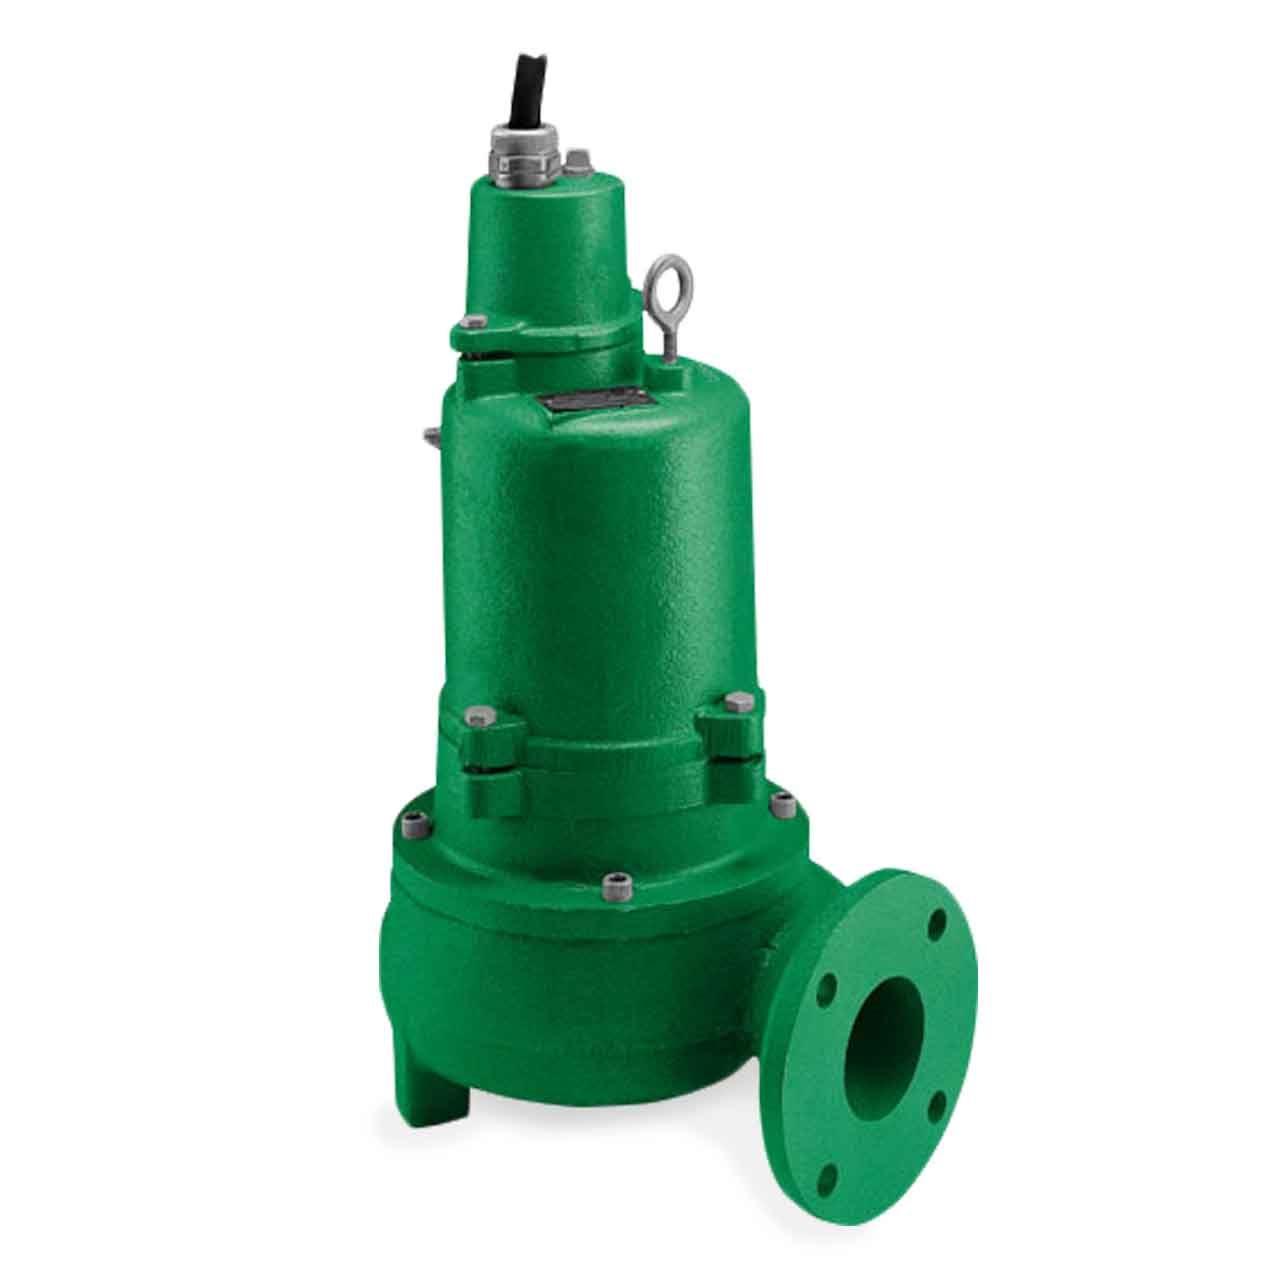 myers myers 3whv30m4 23 submersible sewage pump 3 0 hp 230v 3ph 35 rh rcworst com Meyer Snow Plow Wiring Diagram Meyer E-47 Wiring-Diagram